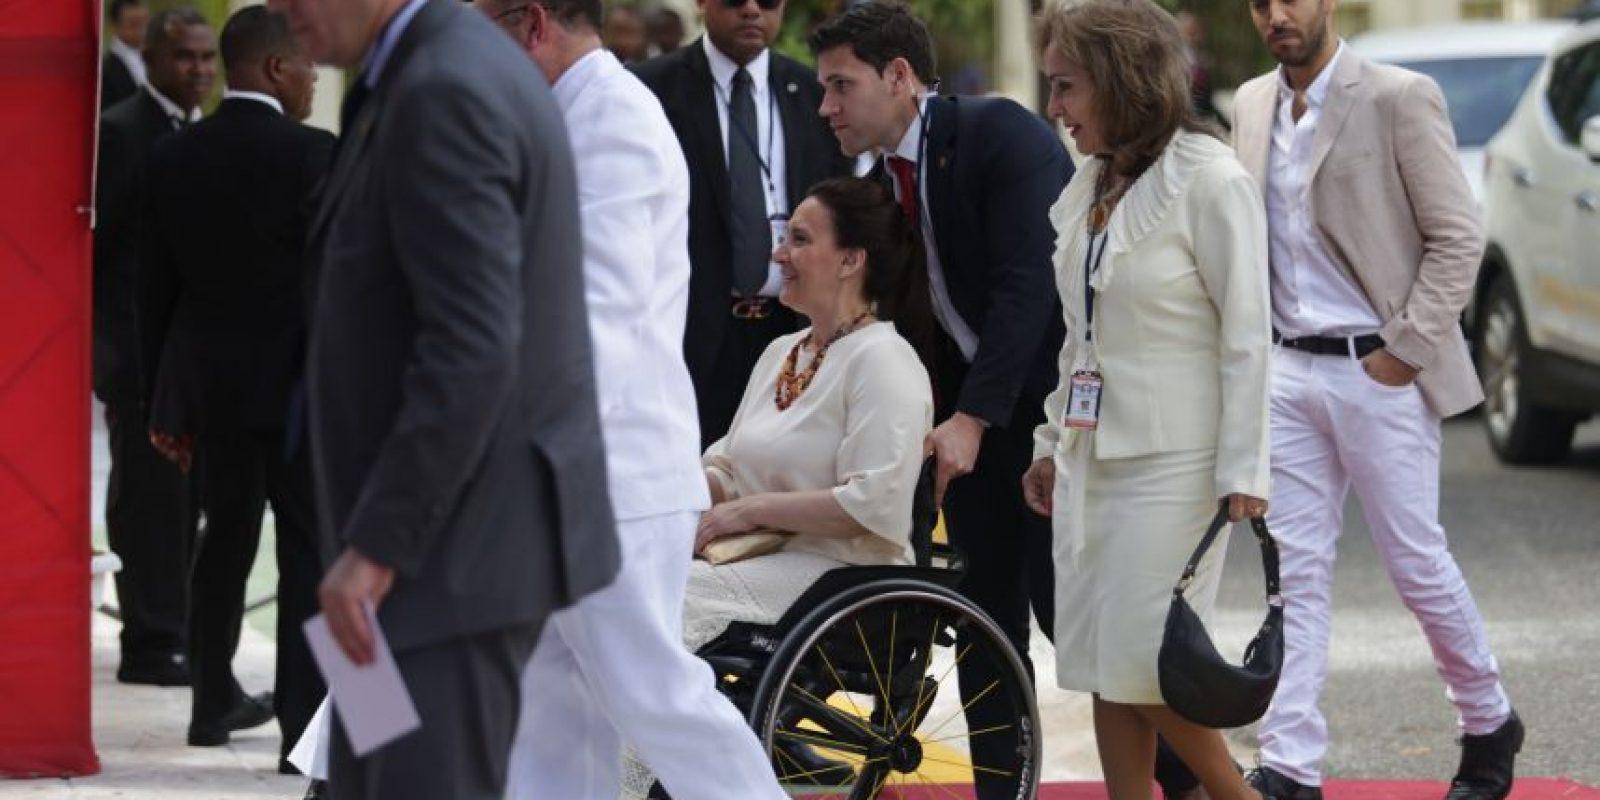 la videpresidente panameña Gabriela Michetti, en silla de ruedas Foto:Roberto Guzmán